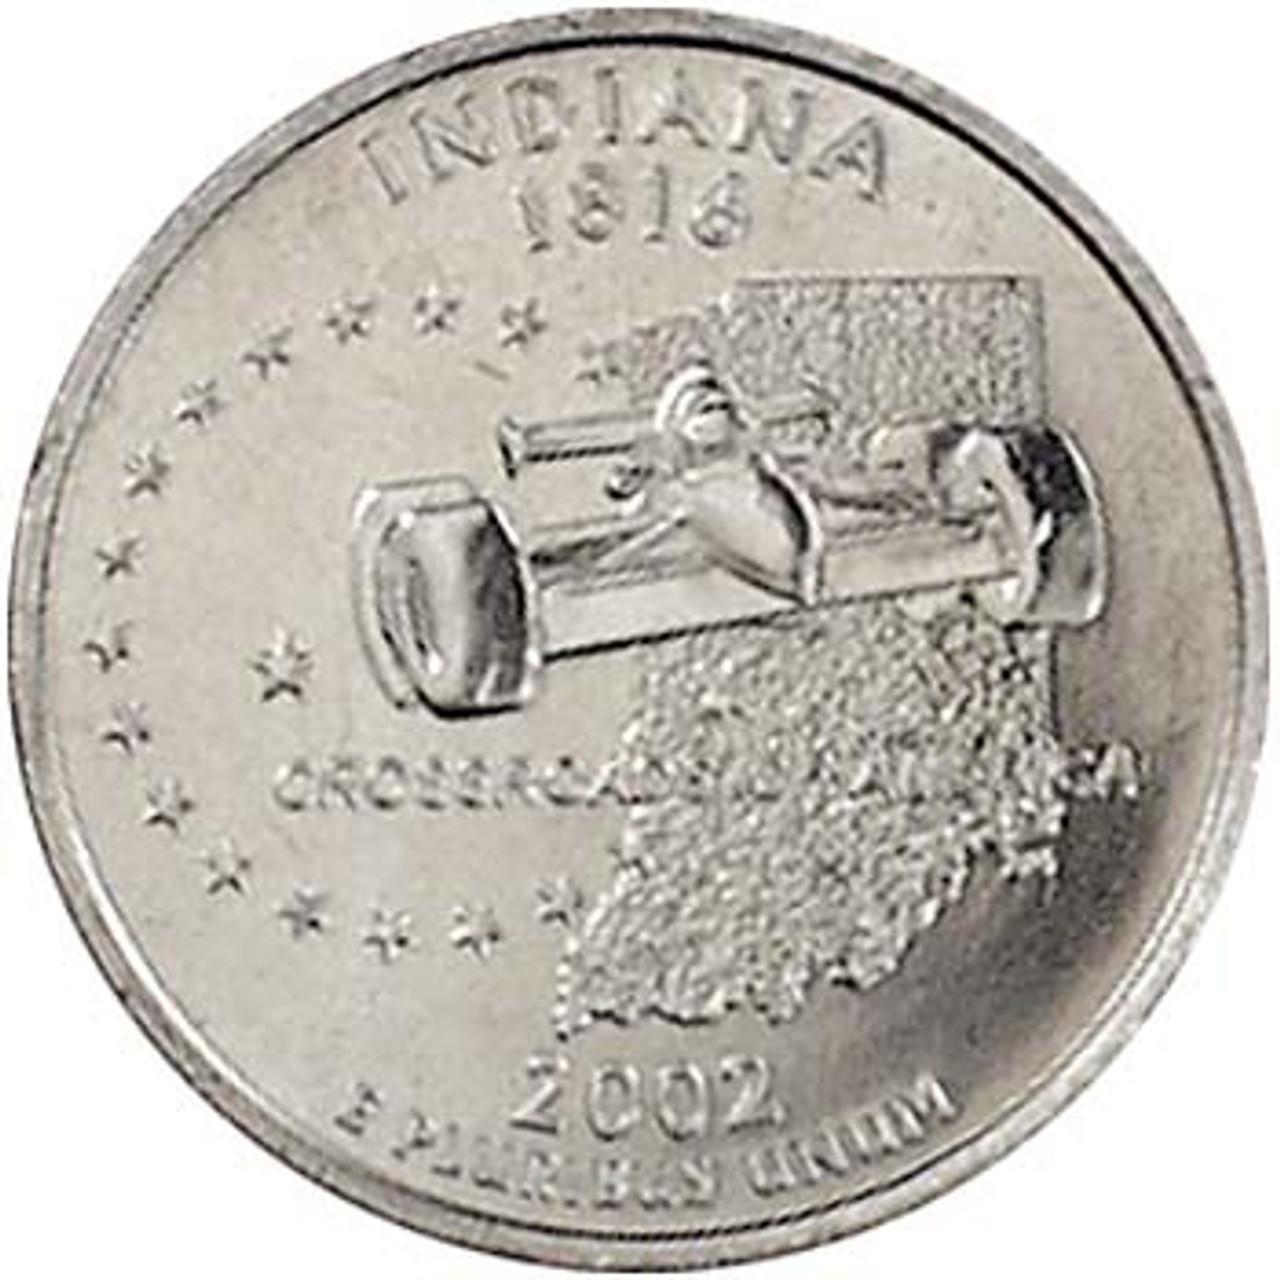 2002-D Indiana Quarter Brilliant Uncirculated Image 1